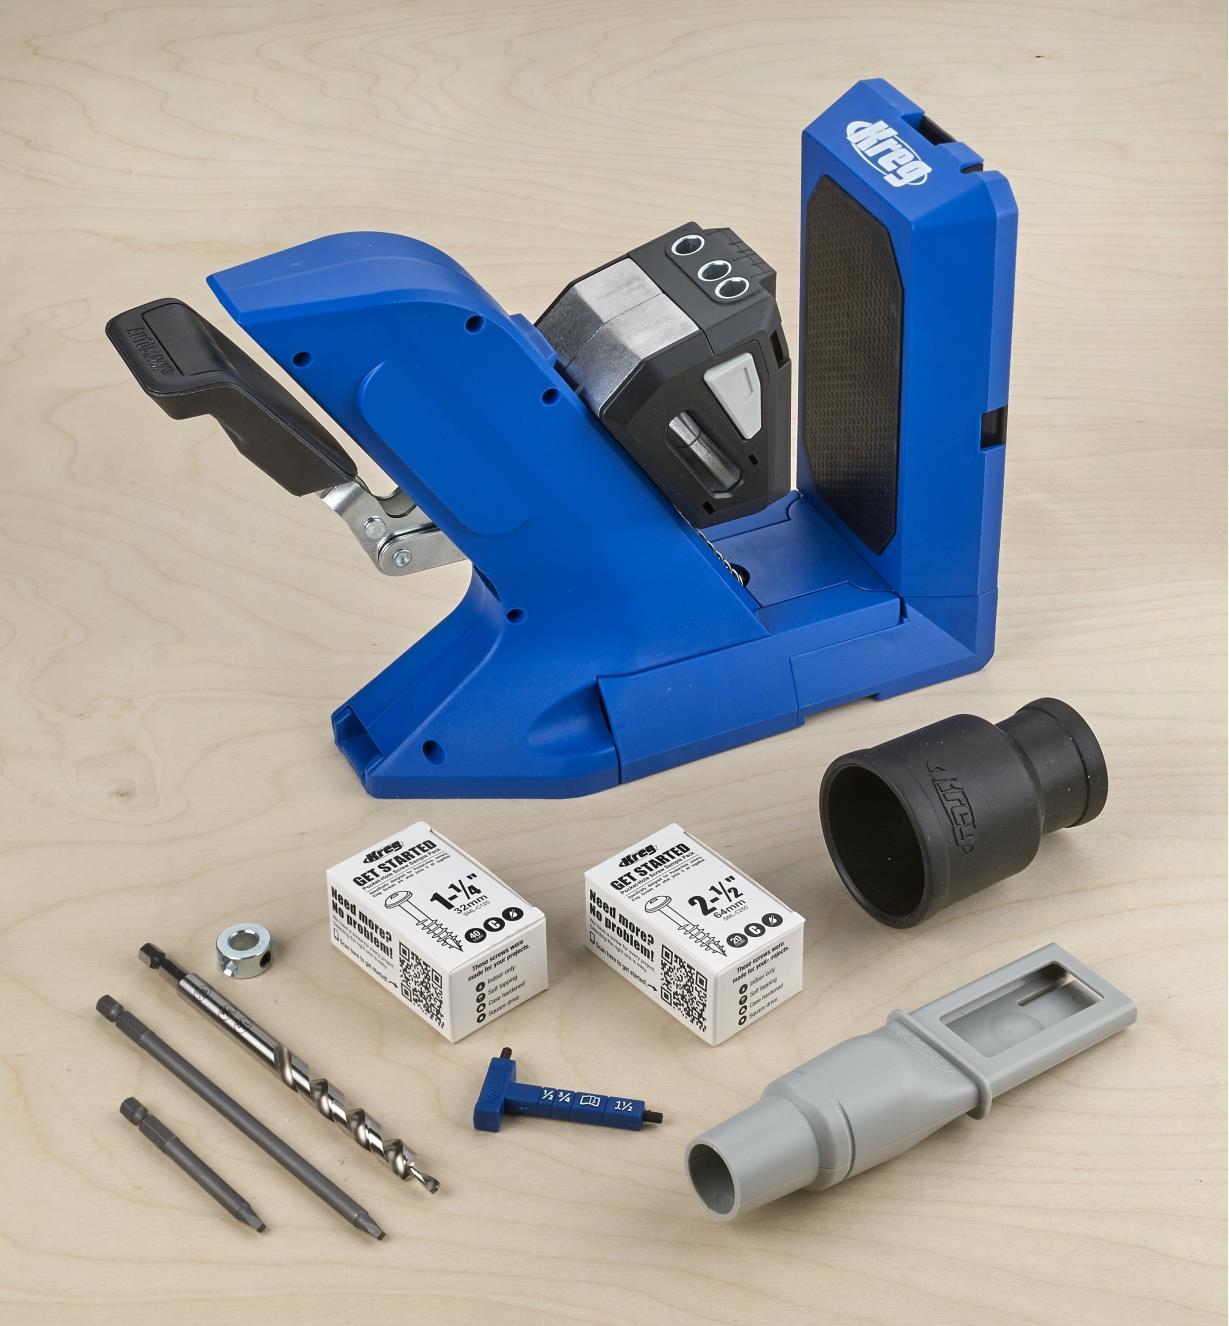 25K6177 - Kreg 720 Pro Pocket-Hole Jig